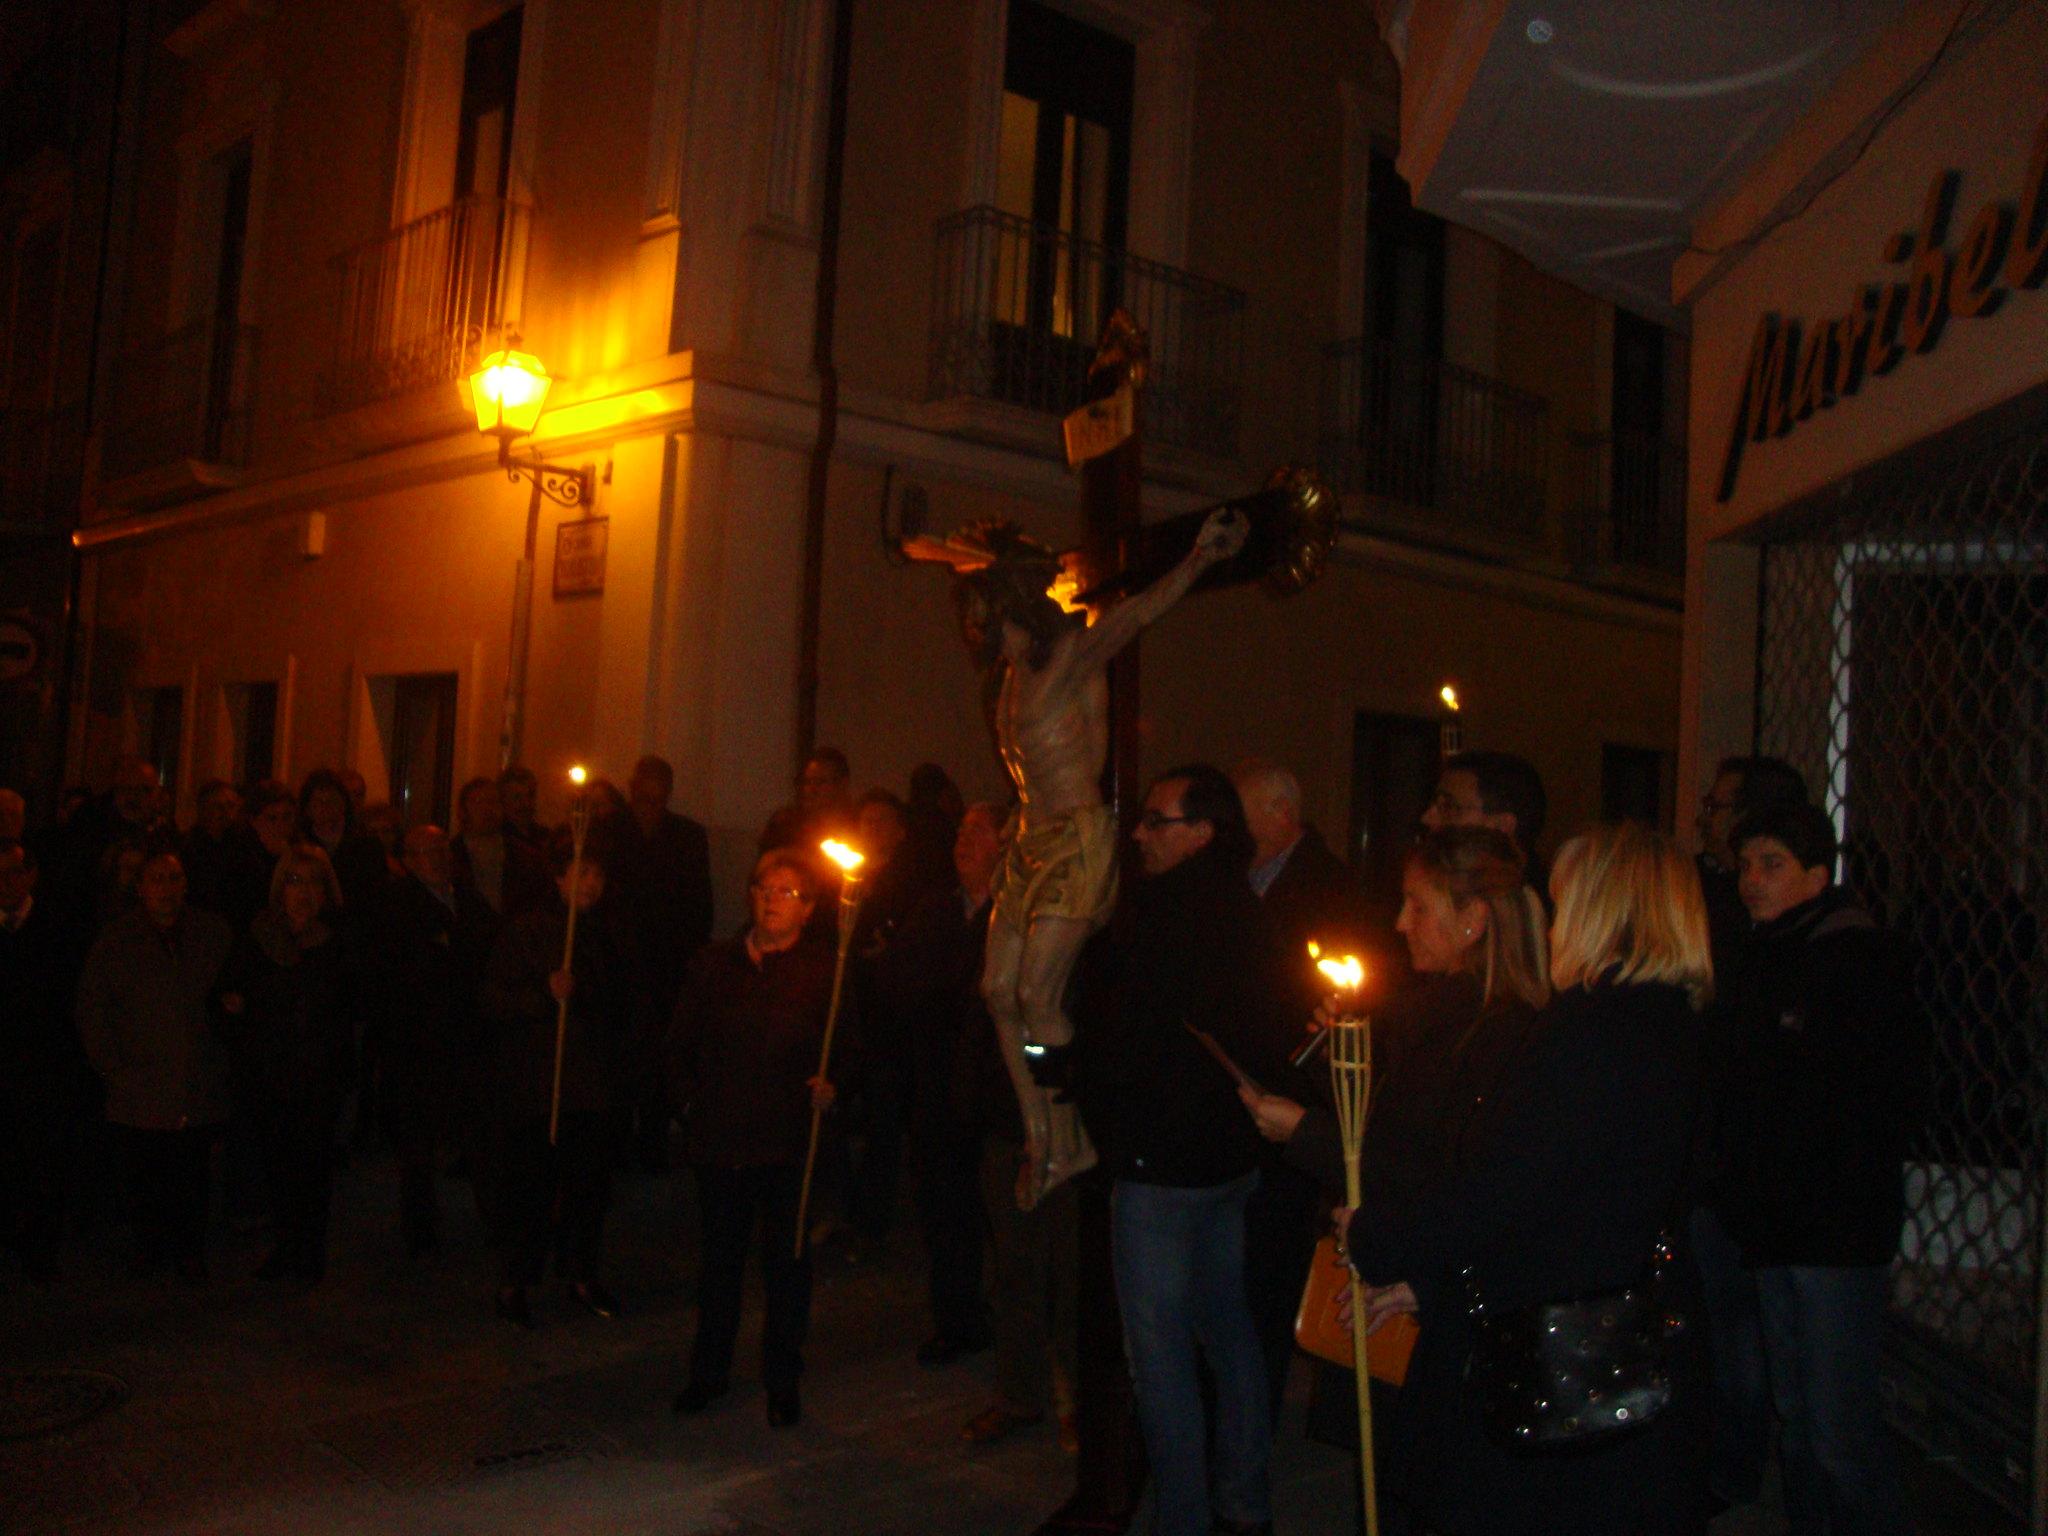 (2013-03-22) - IV Vía Crucis nocturno - Javier Montesinos Villaplana (01)